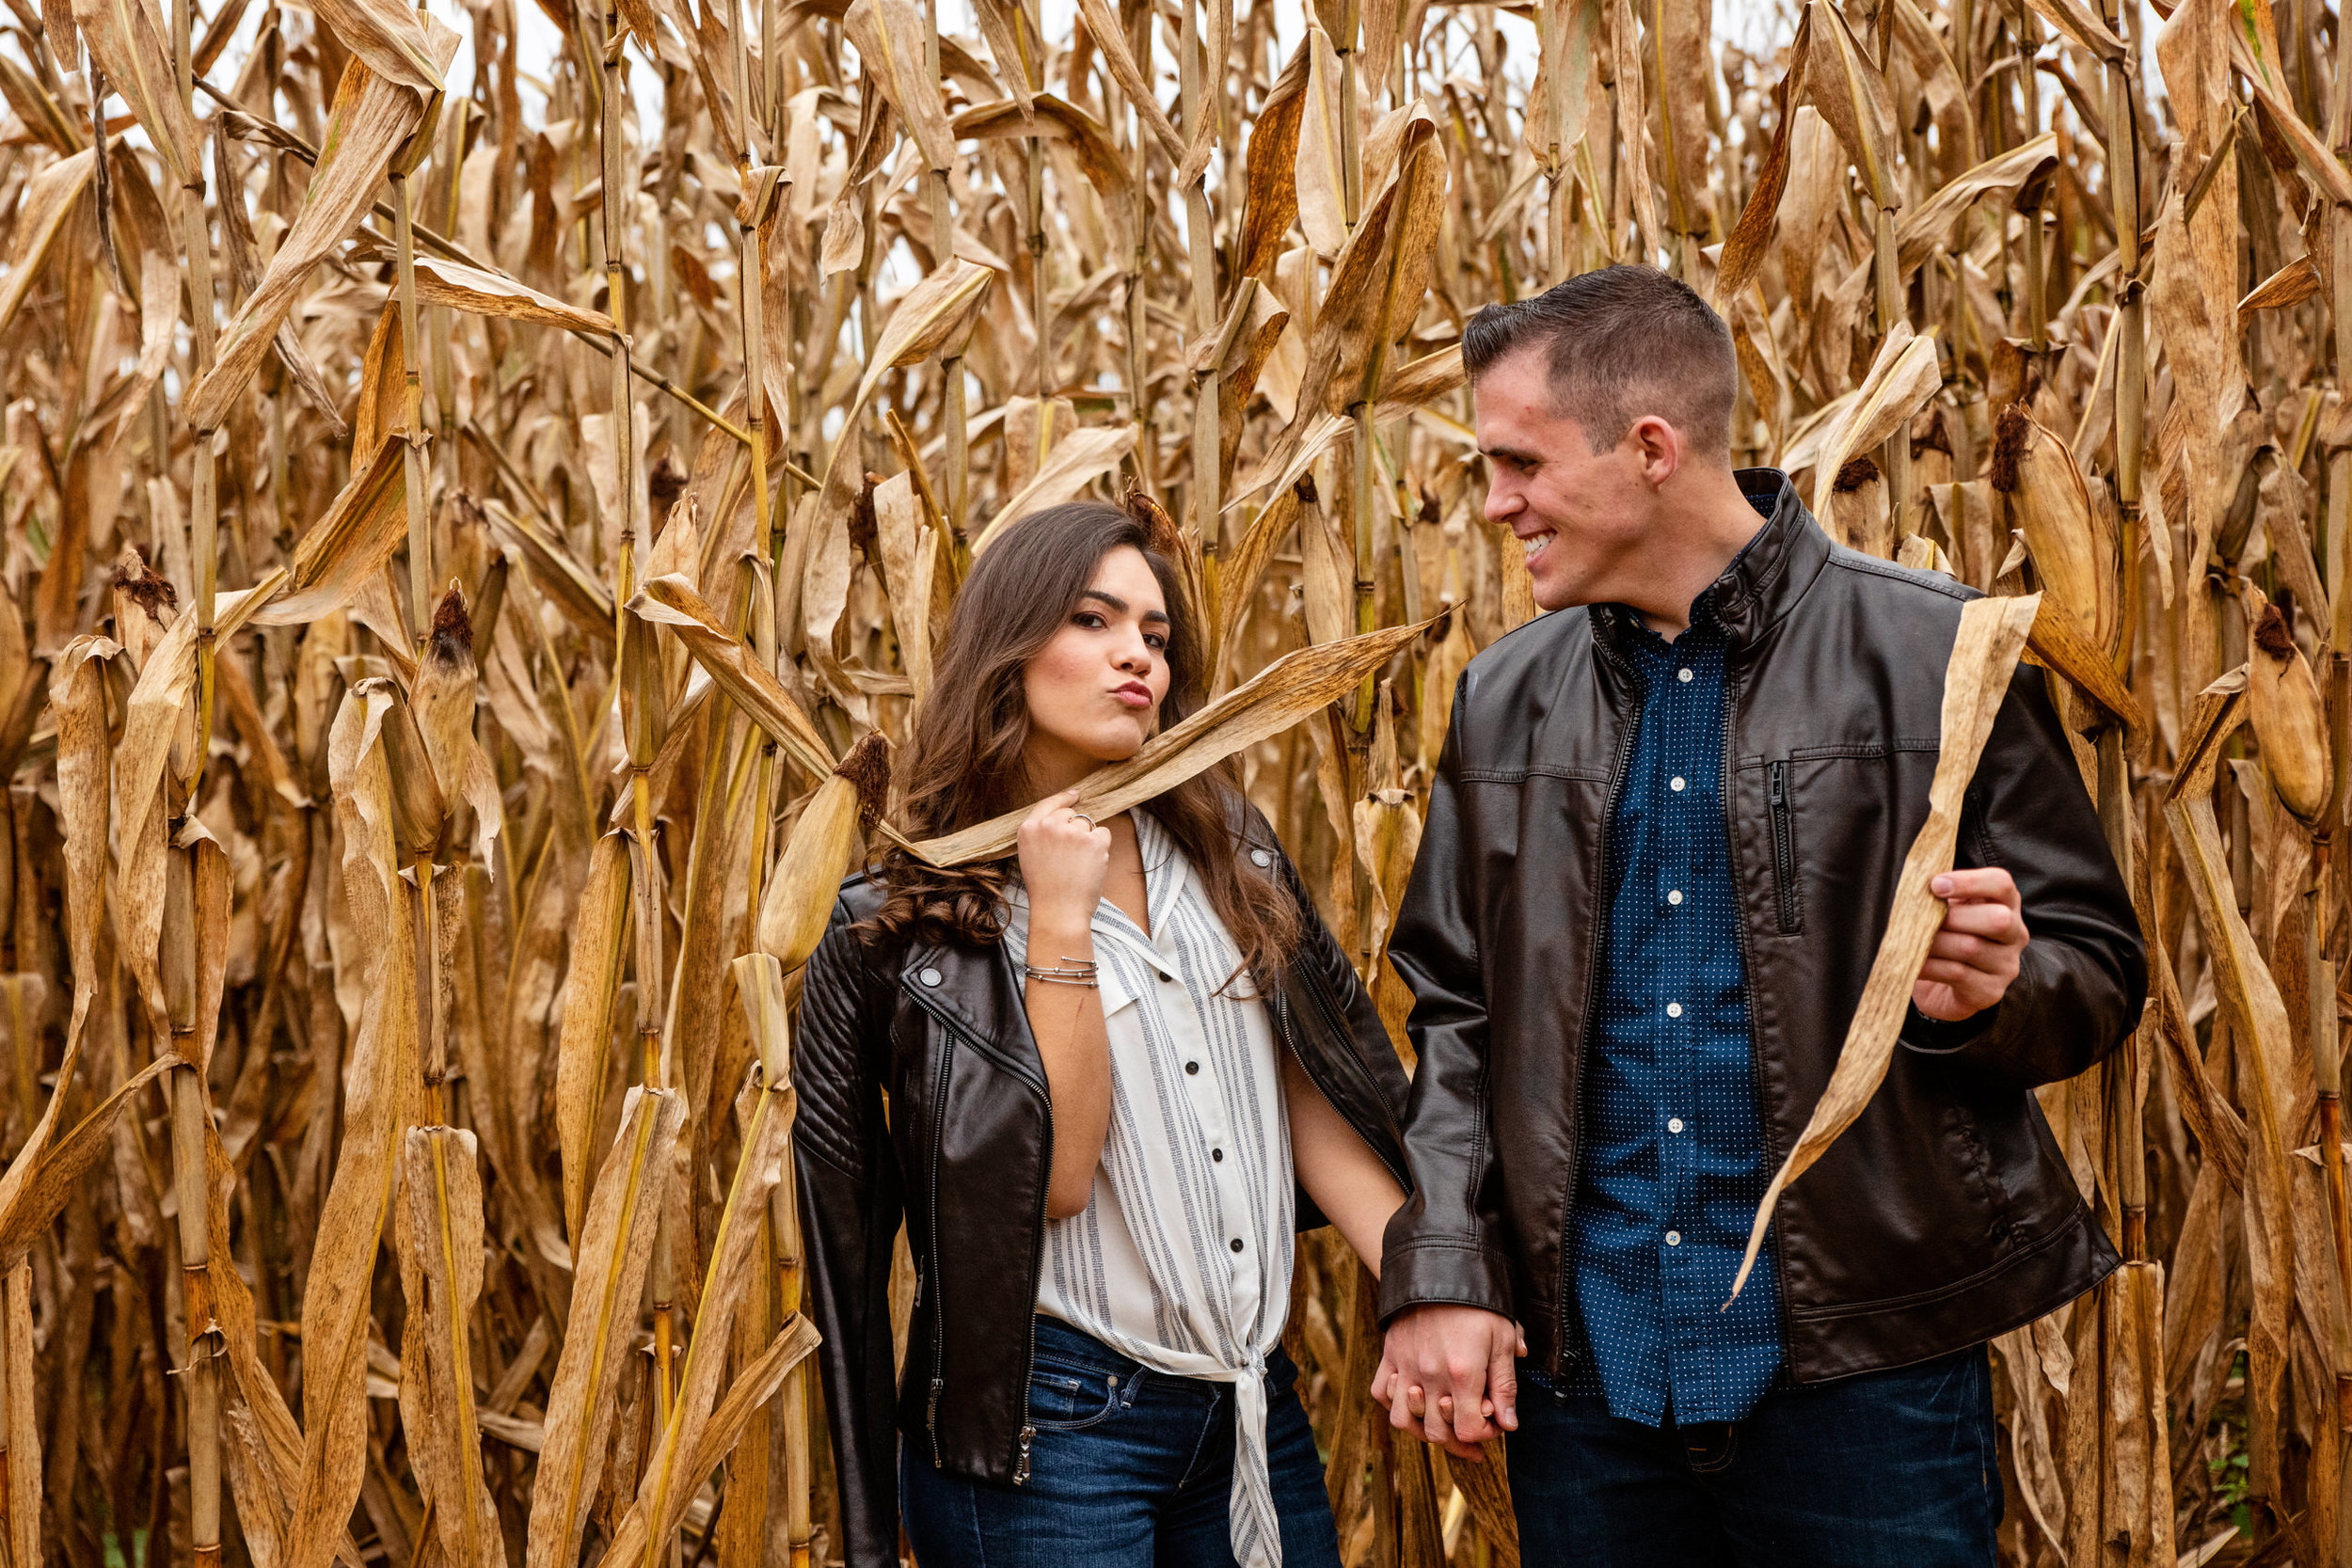 MarylandAdventureEngagement-Brenda&Tony-5.jpg